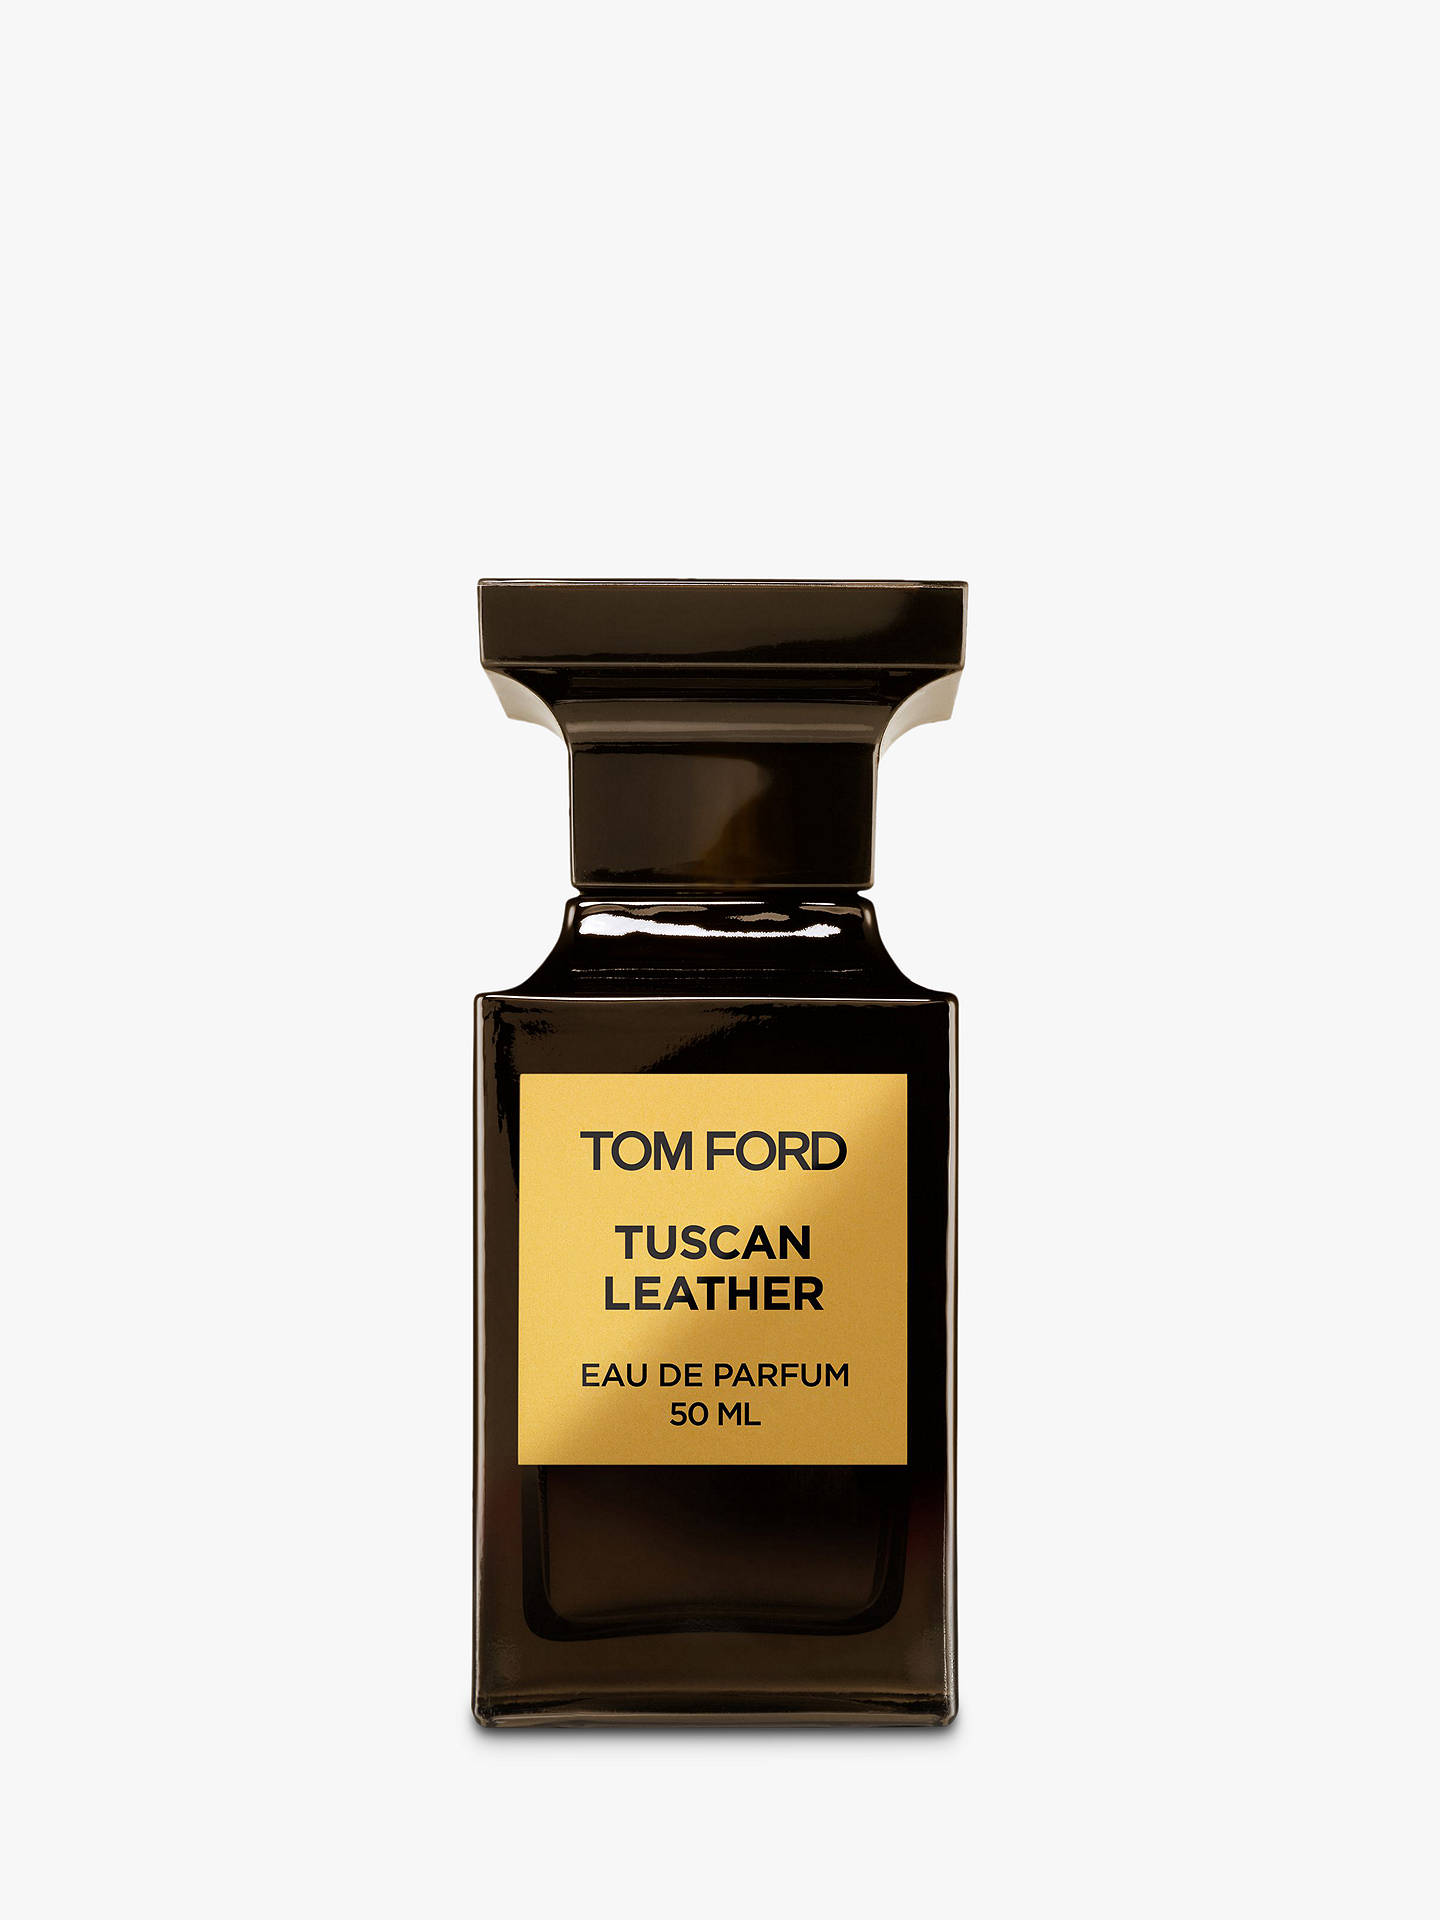 Tom Ford Private Blend Tuscan Leather Eau De Parfum 50ml At John